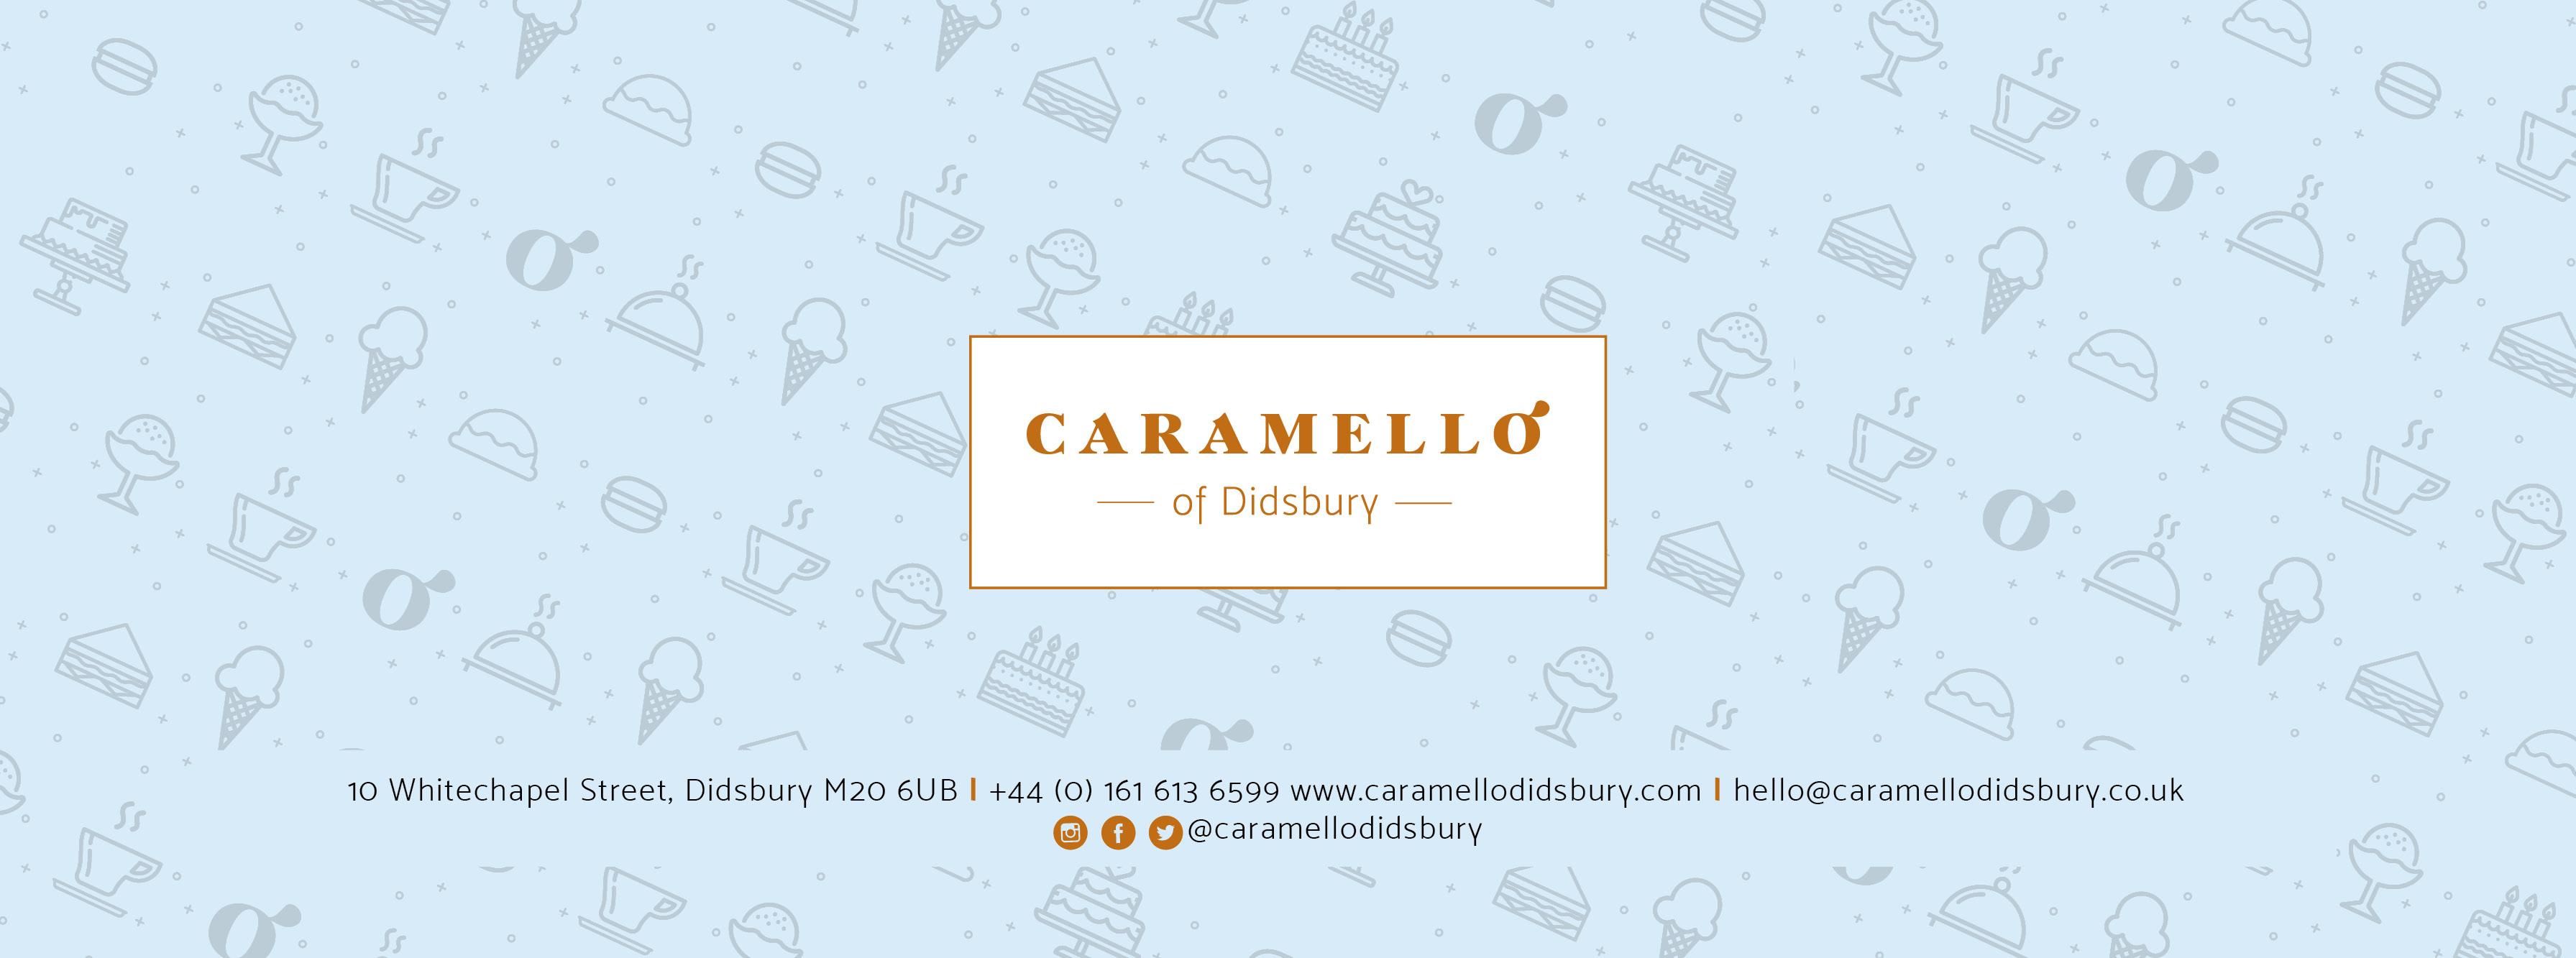 Caramello of Didsbury